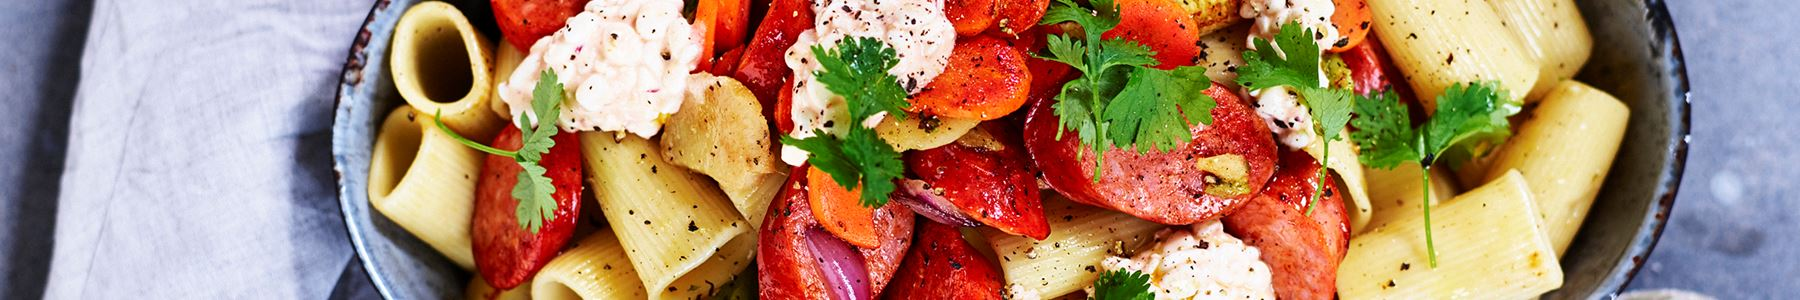 Styckningsdetaljer + Paprika + Fryst